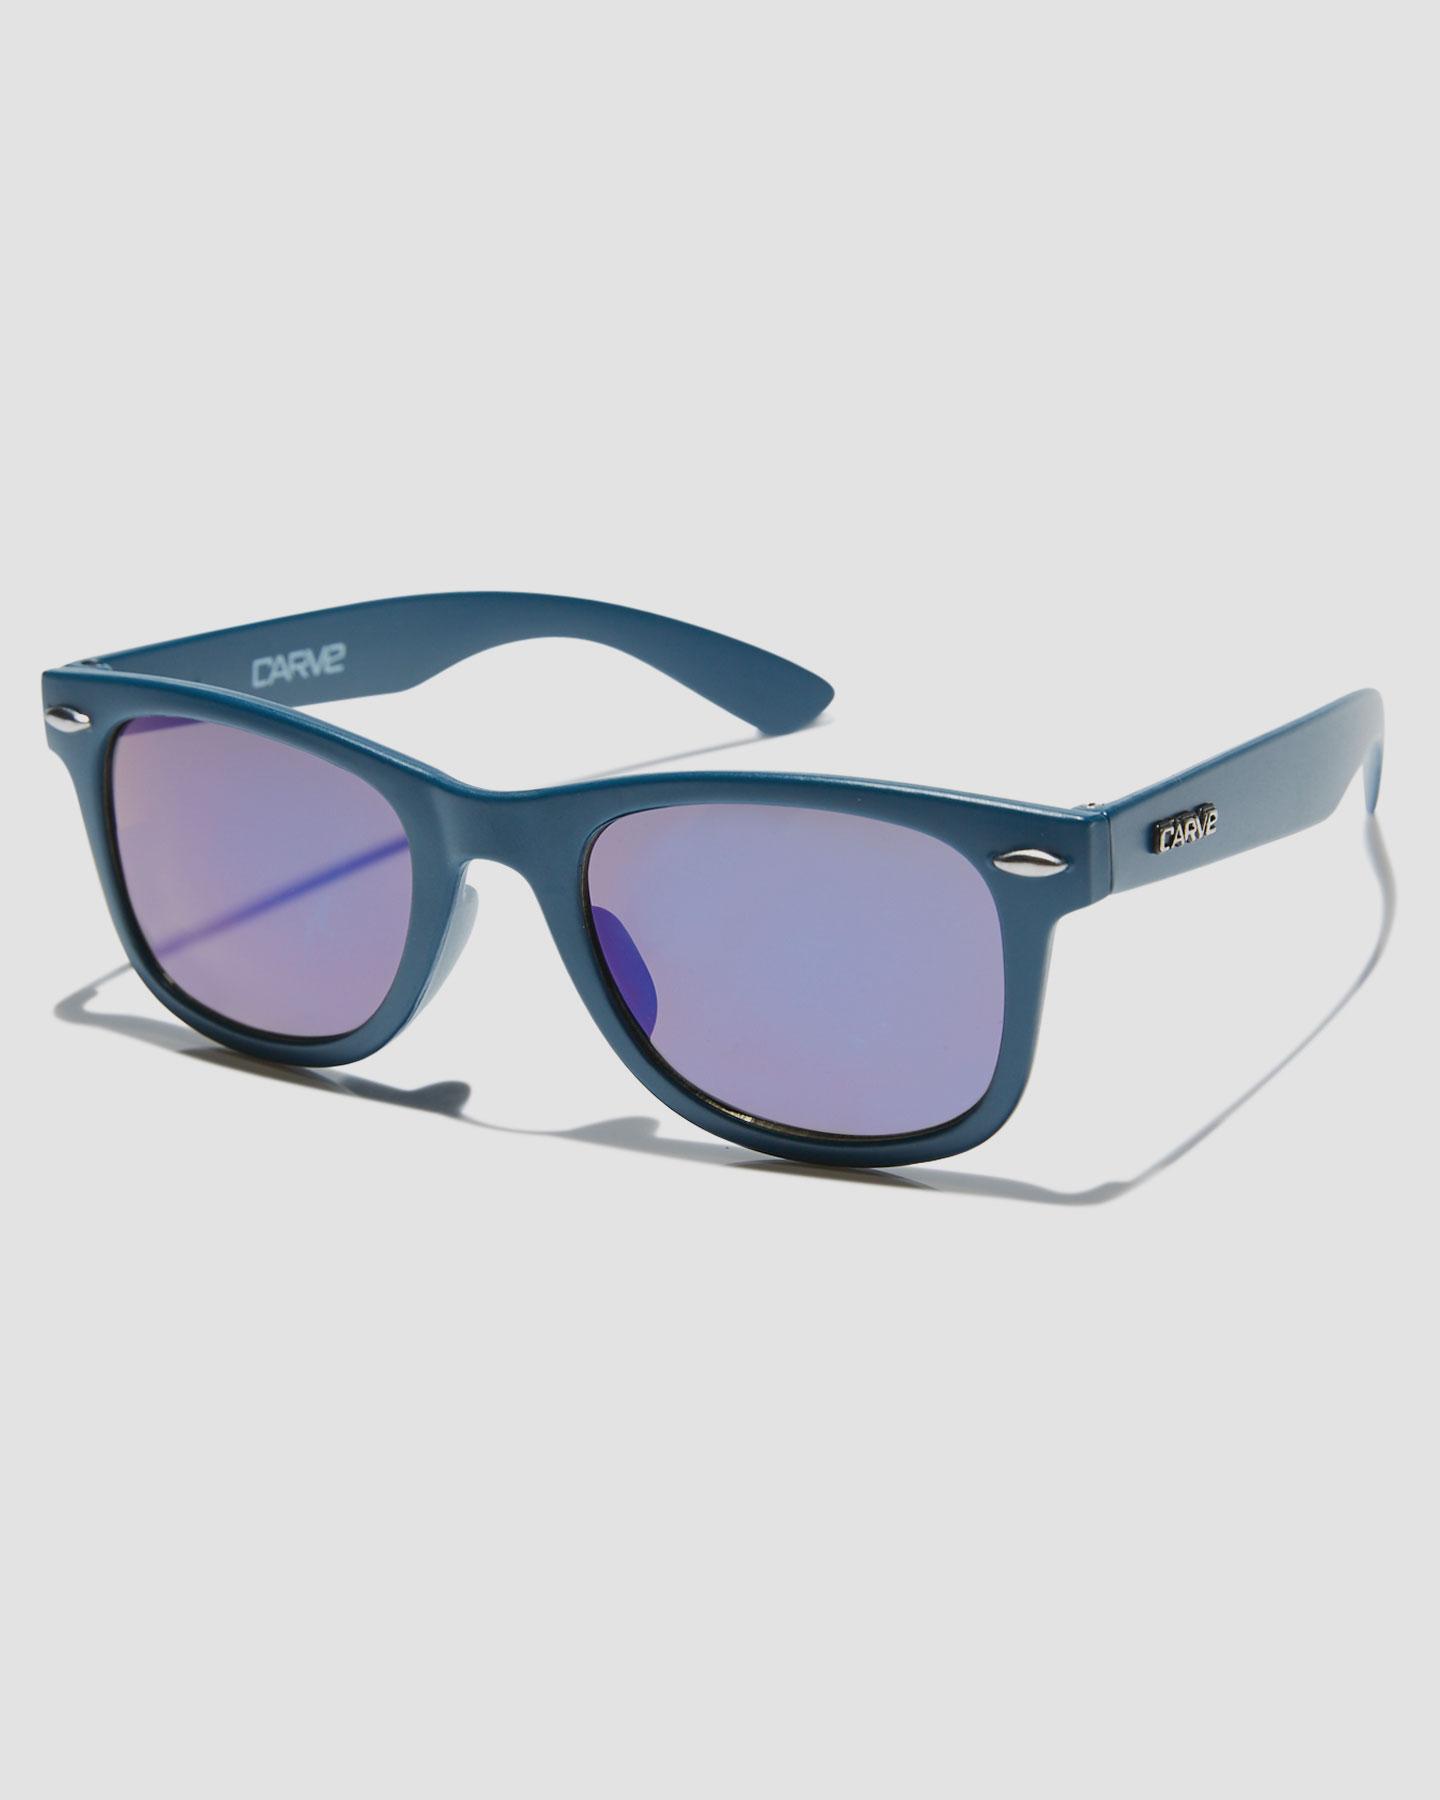 Carve Kids Digger Sunglasses Matte Navy Revo Matte Navy Revo